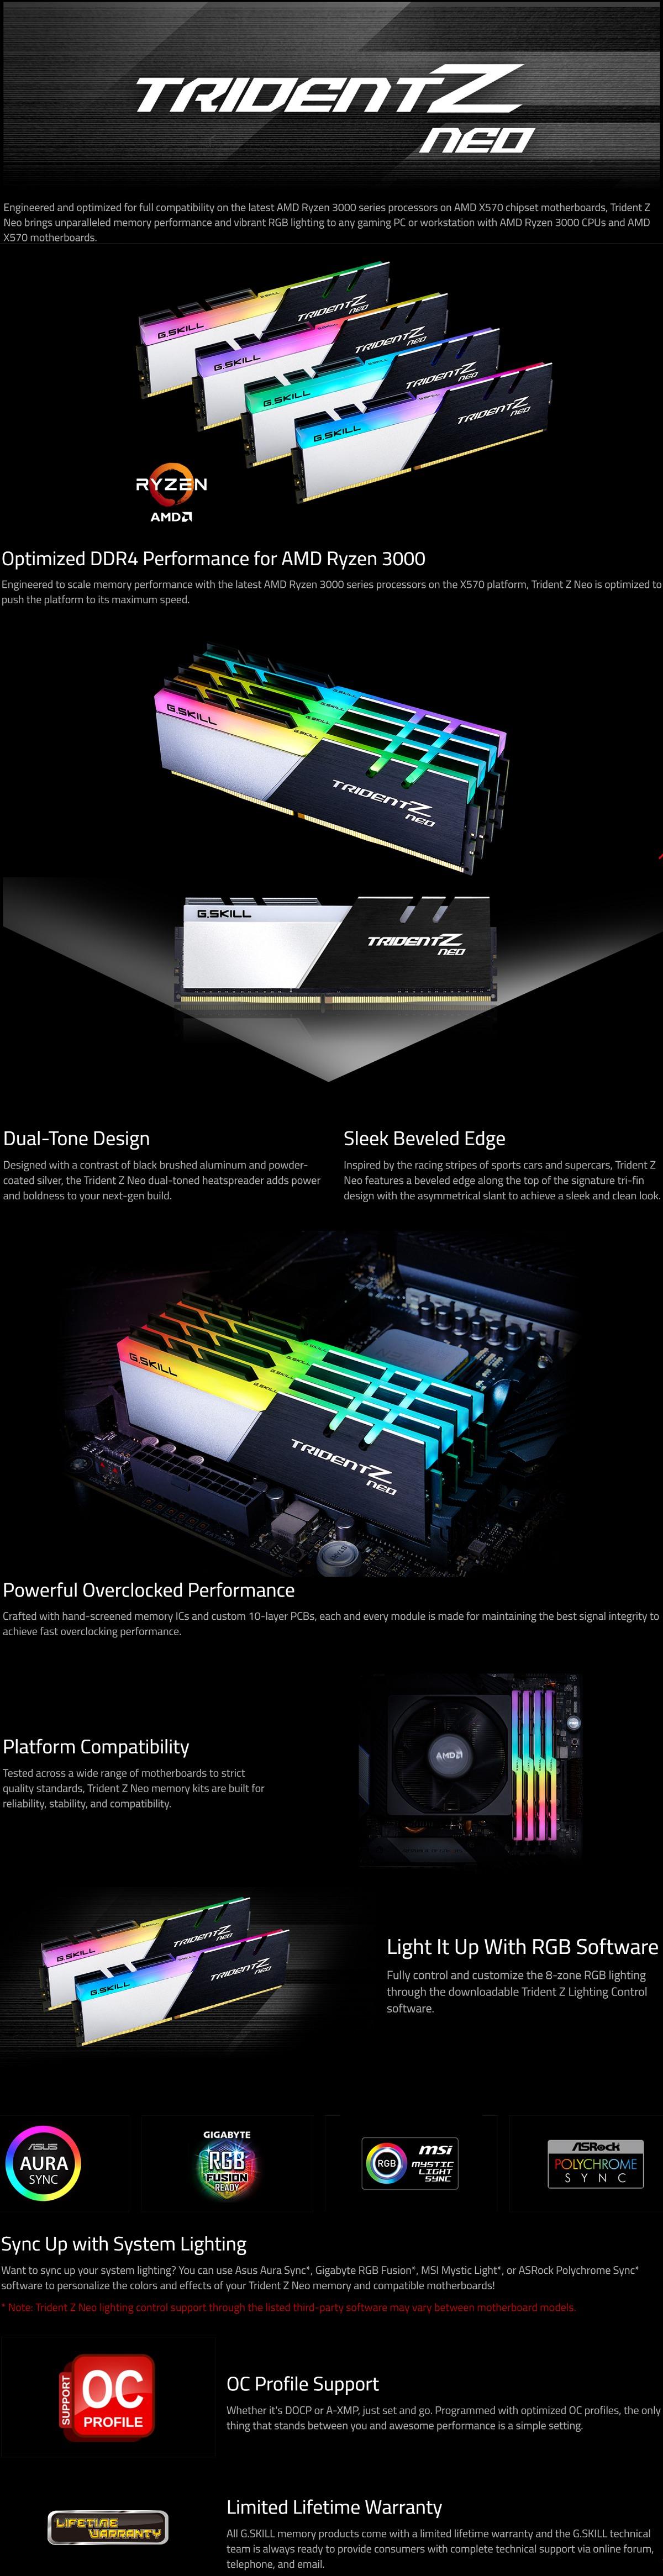 G Skill Trident Z Neo 32GB (2x16GB) 3600MHz DDR4 Desktop Memory Kit